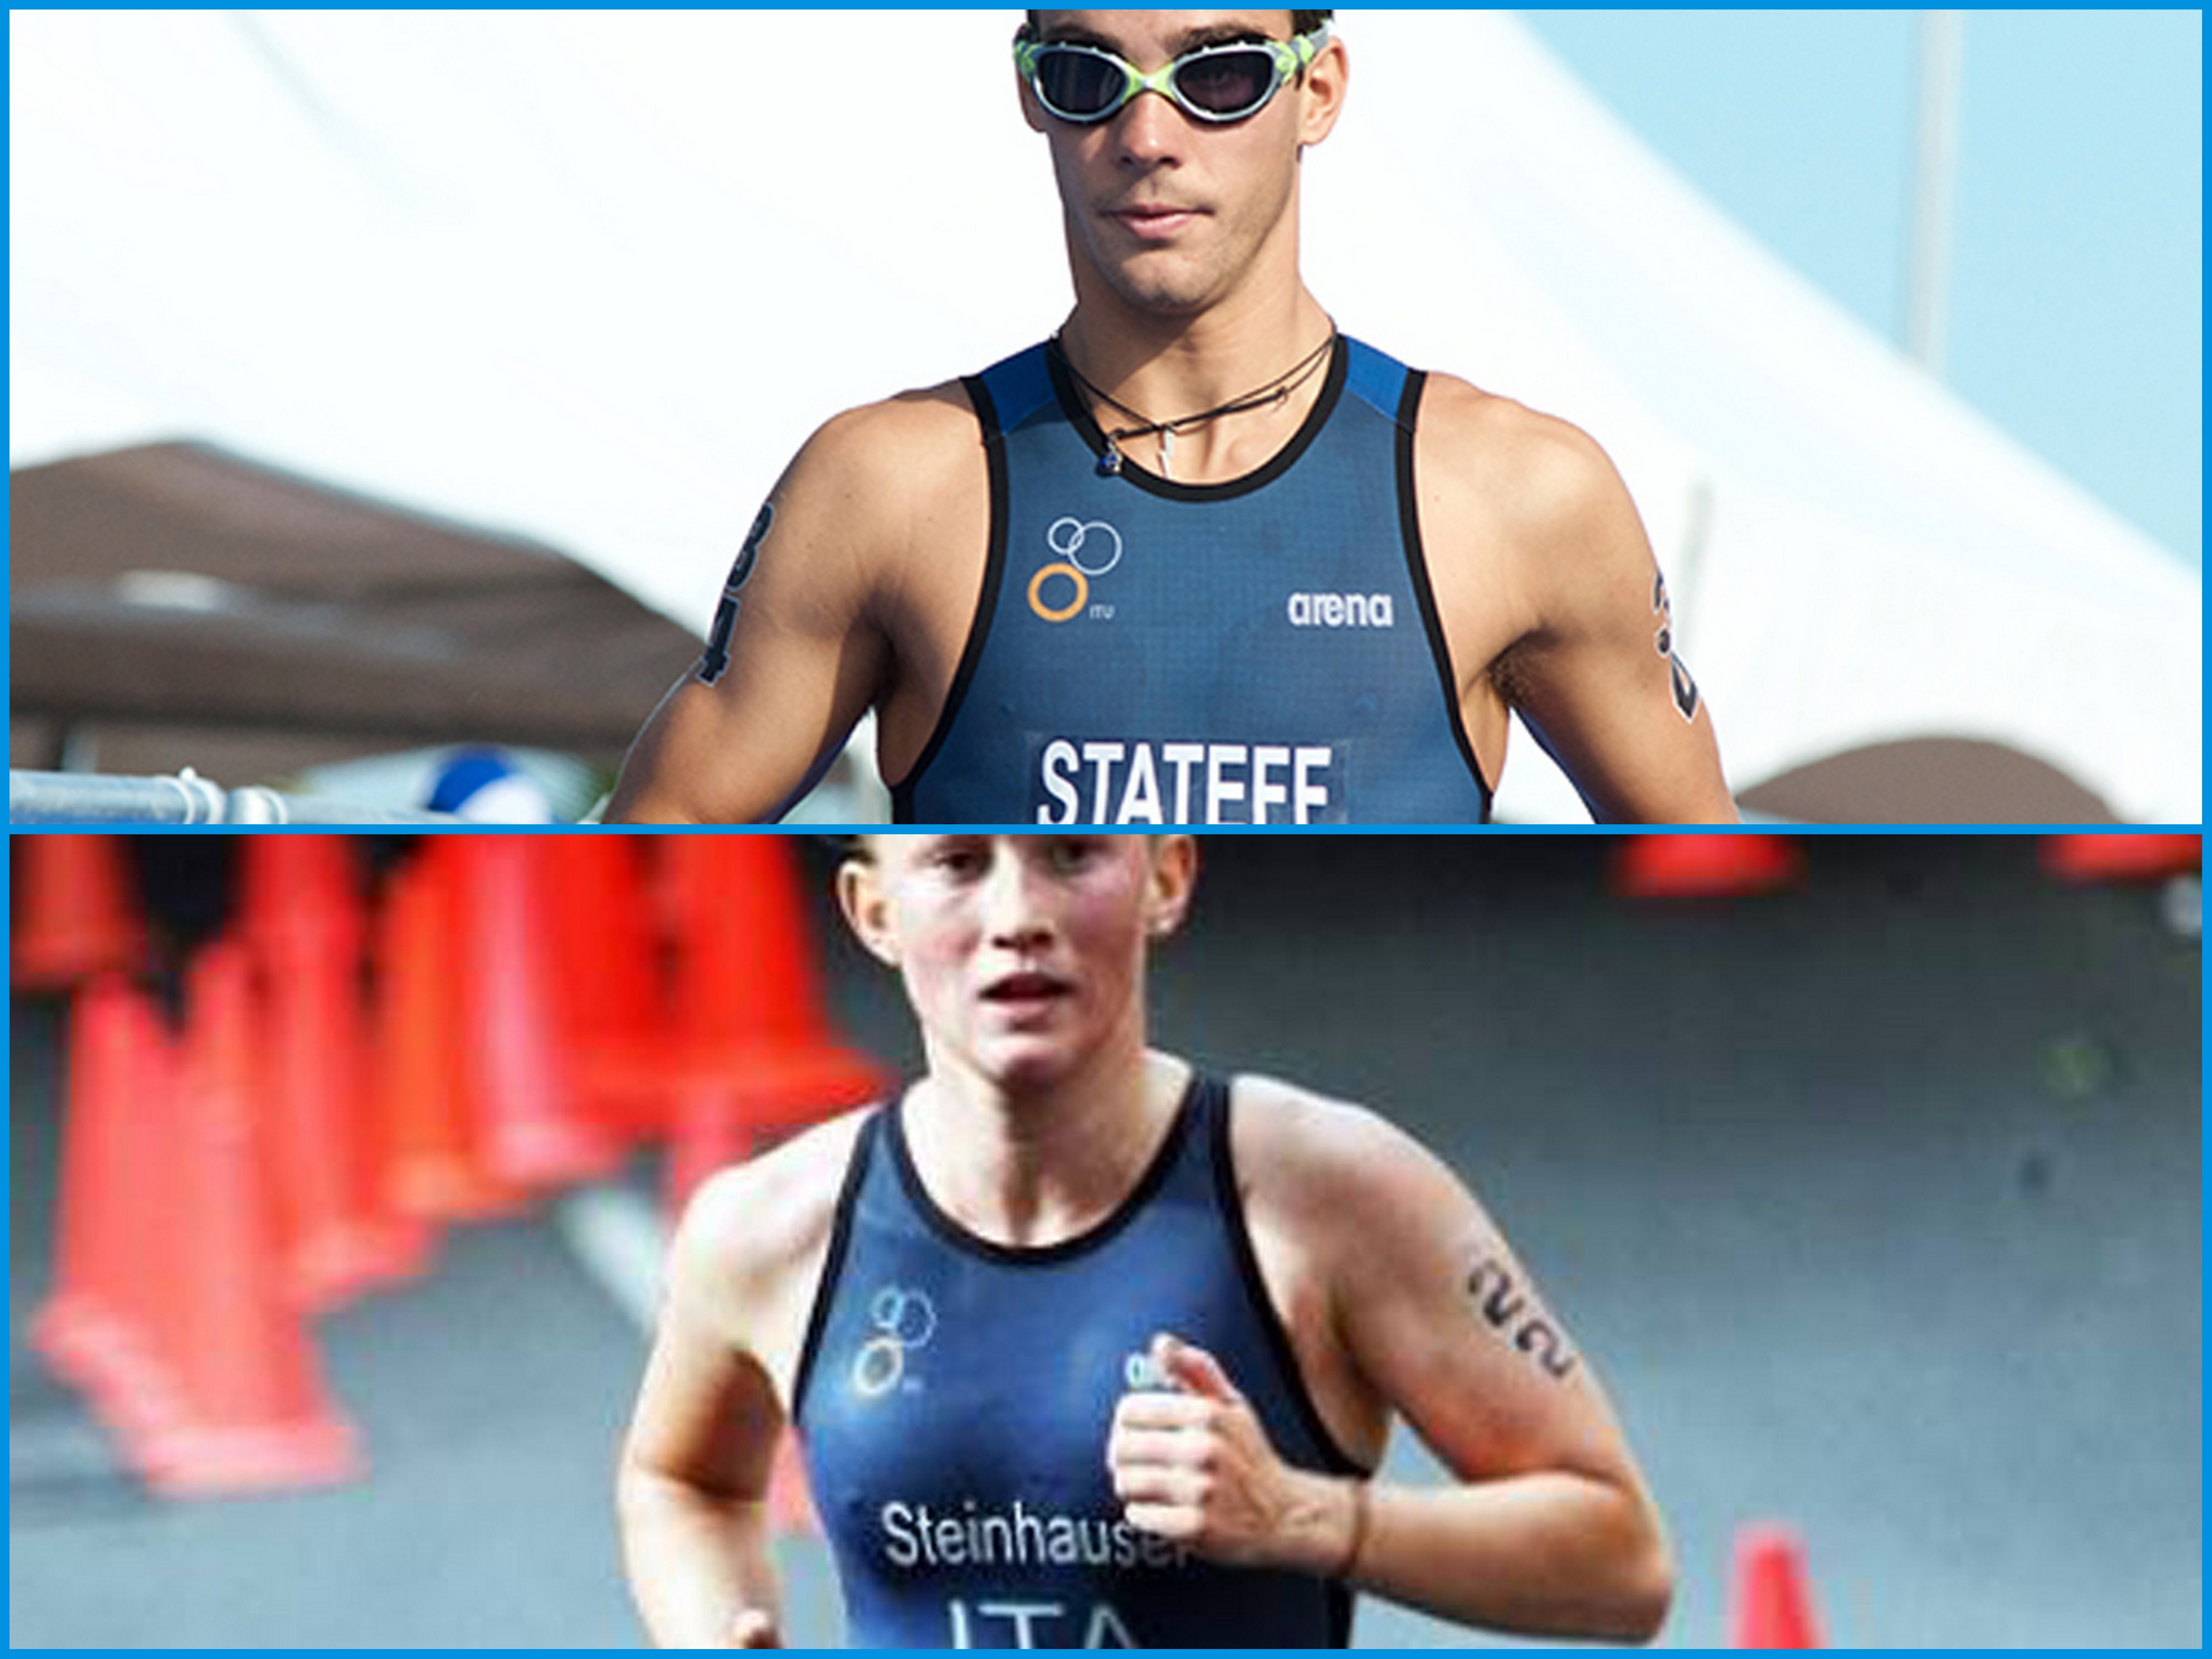 triathlon coppa del mondo 2017 miyazaki verena steinhauser e delian stateff italia nazionale